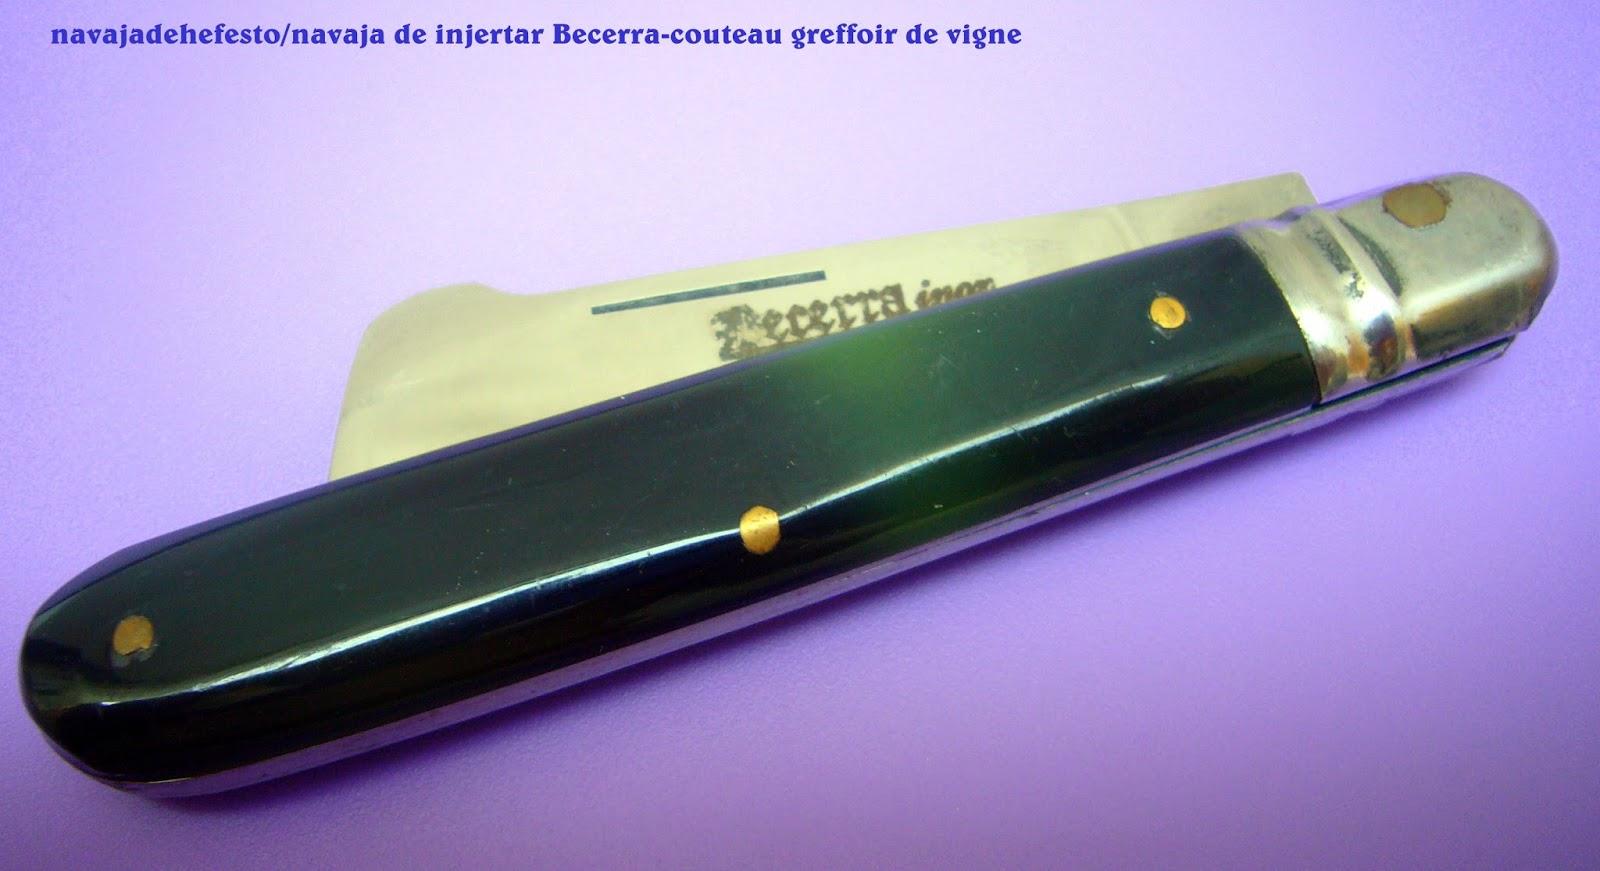 La navaja de hefesto o le petit jardin des couteaux 32 - Navaja de injertar ...